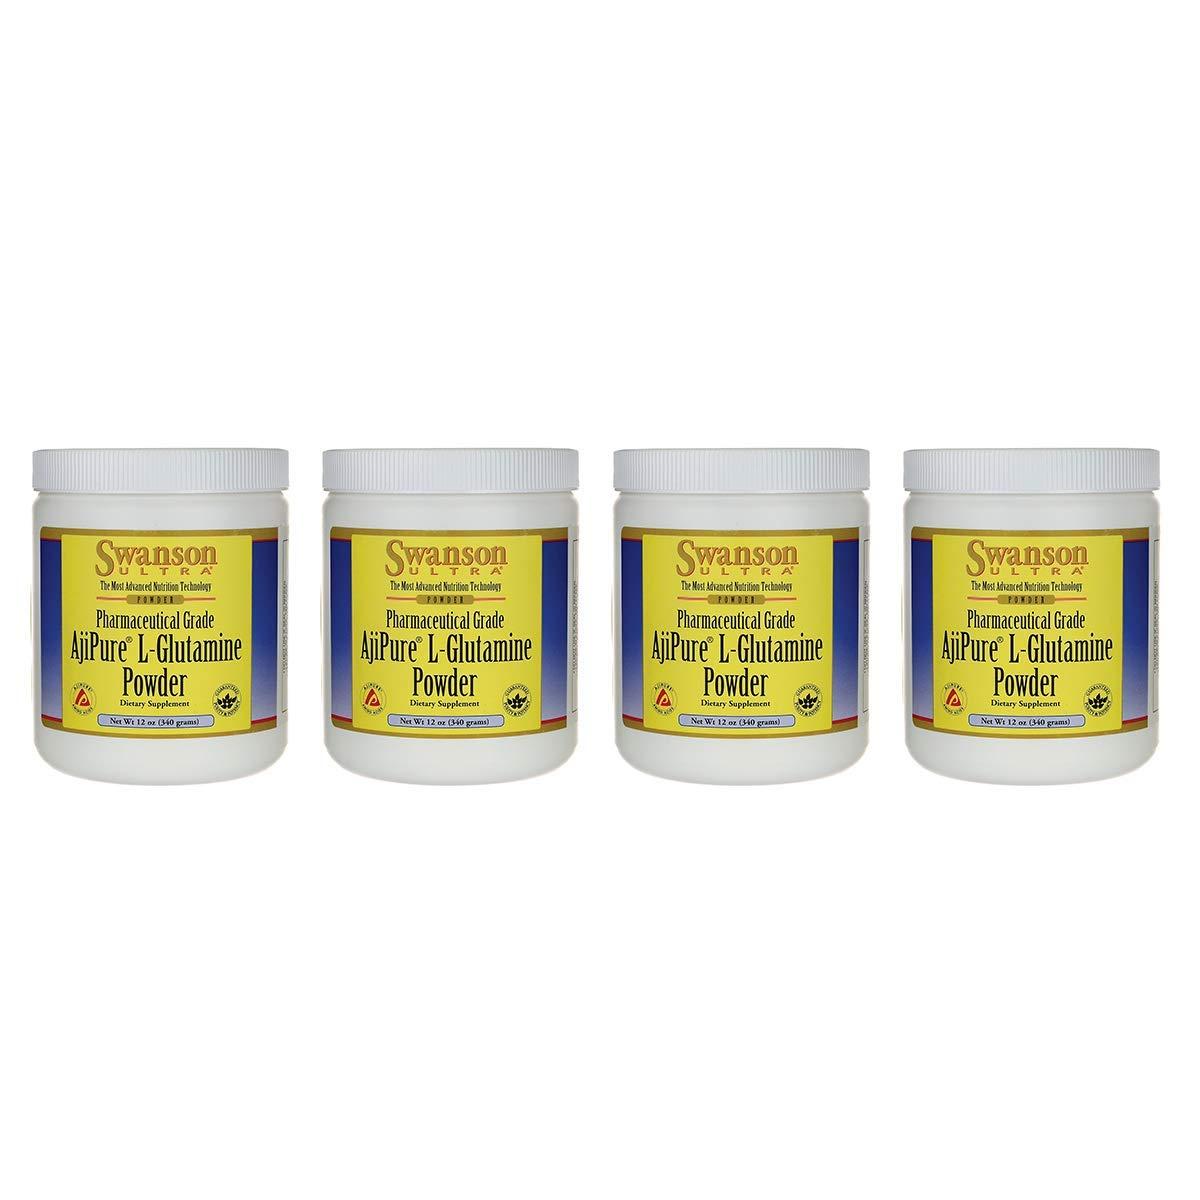 Swanson Amino Acid Ajipure L-Glutamine Powder 12 Ounce (340 g) Pwdr (4 Pack)